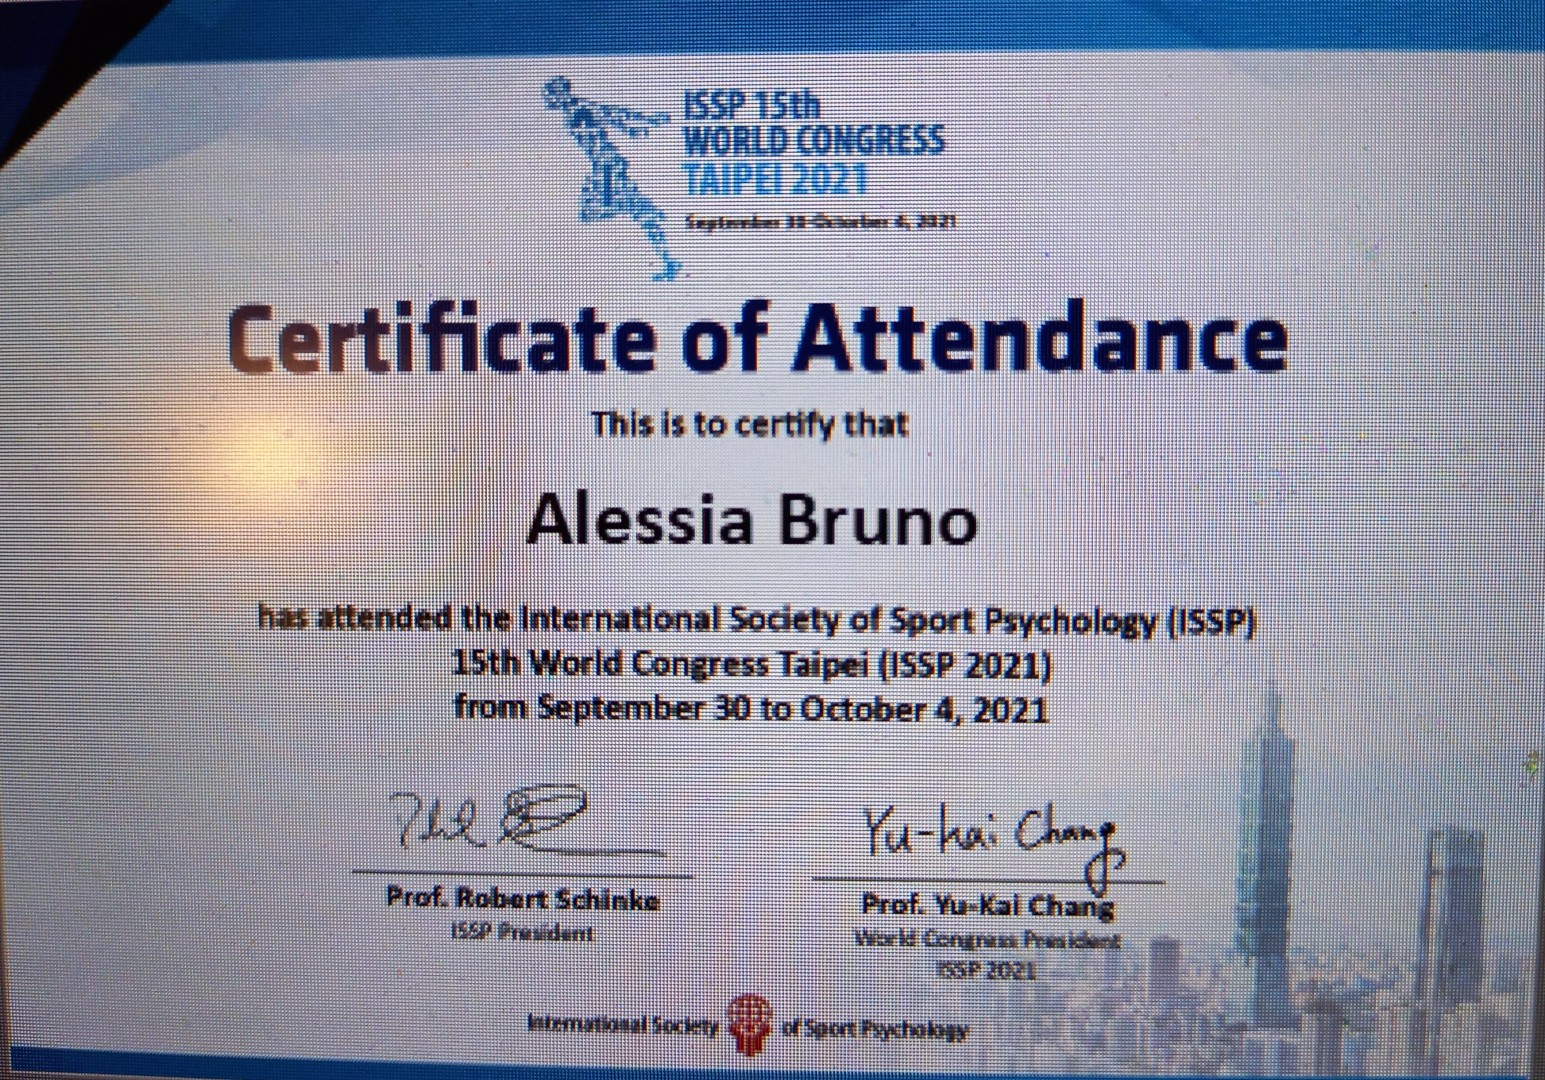 Sport World Congress Taipei 2021